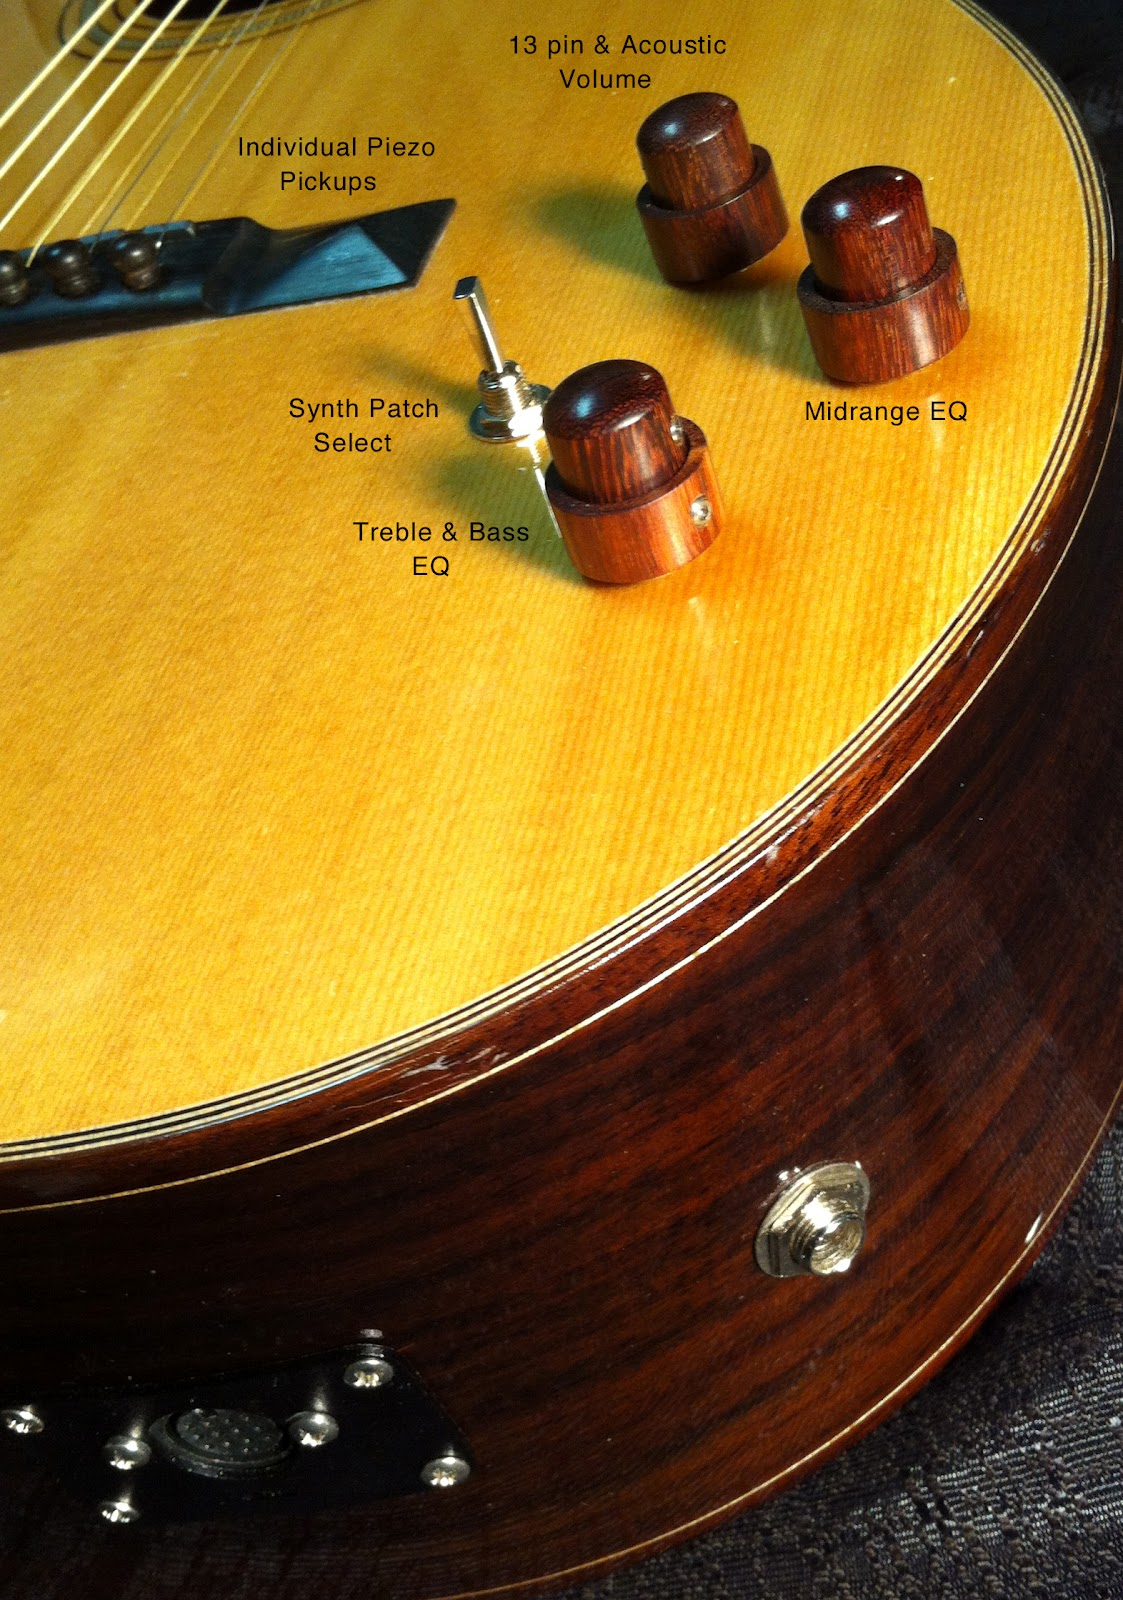 http://2.bp.blogspot.com/-3_r3oAvrEP4/T2_P5zHzGDI/AAAAAAAAAKc/bWoZyRfwQb8/s1600/2-Acoustic-MIDI-with+Controls+labeled.jpg